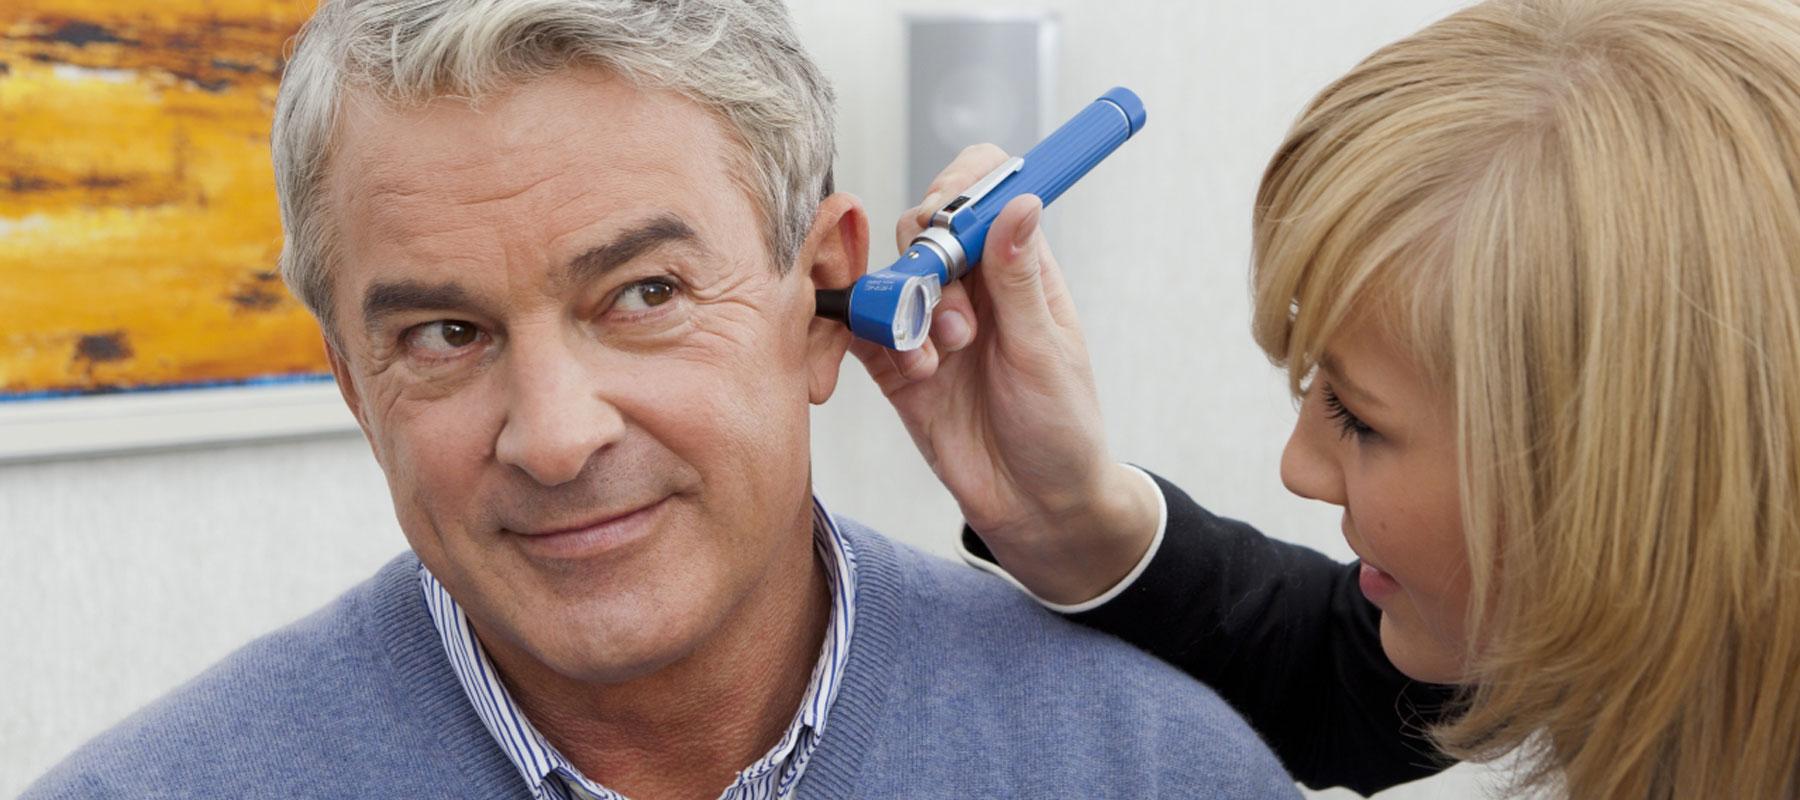 Hörgeräteversorgung bei einer Hörminderung